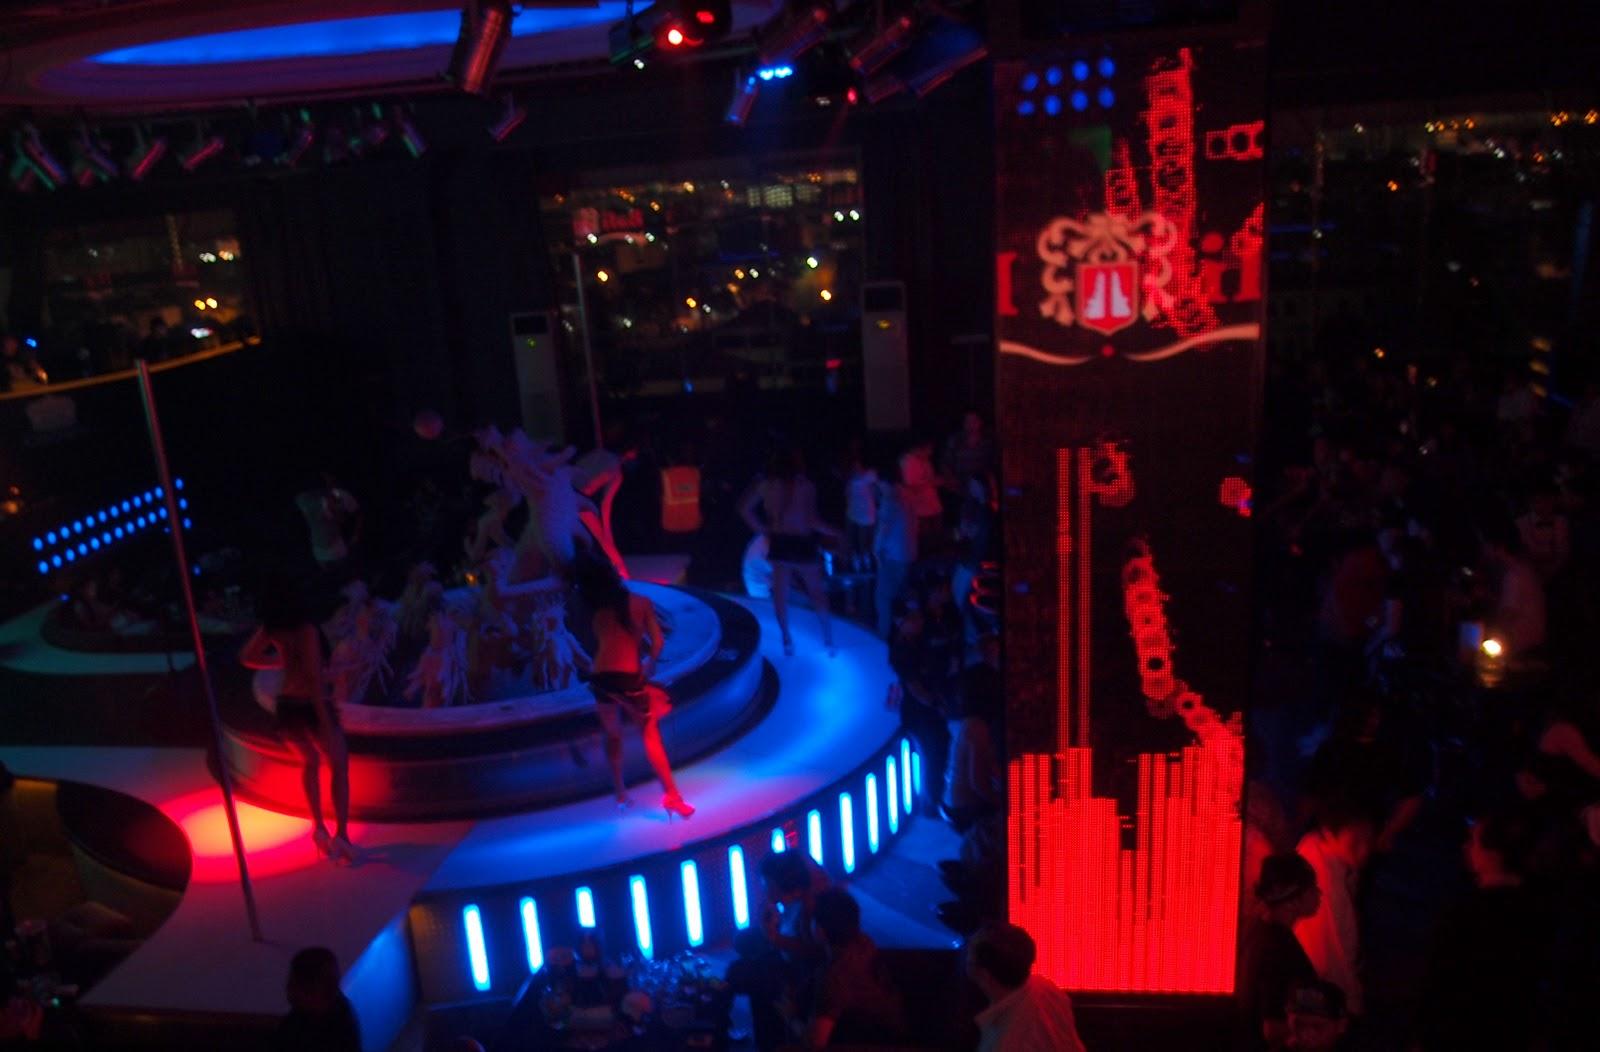 2011 Jakarta Nightlife's Top 100 Bars & Nightclubs | The Best ...